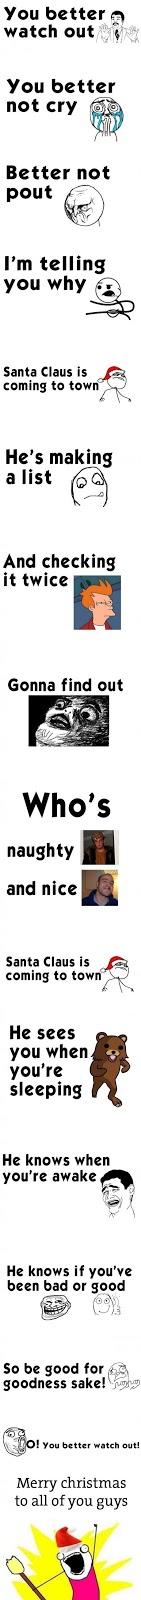 Happy Merry Christmas In Meme